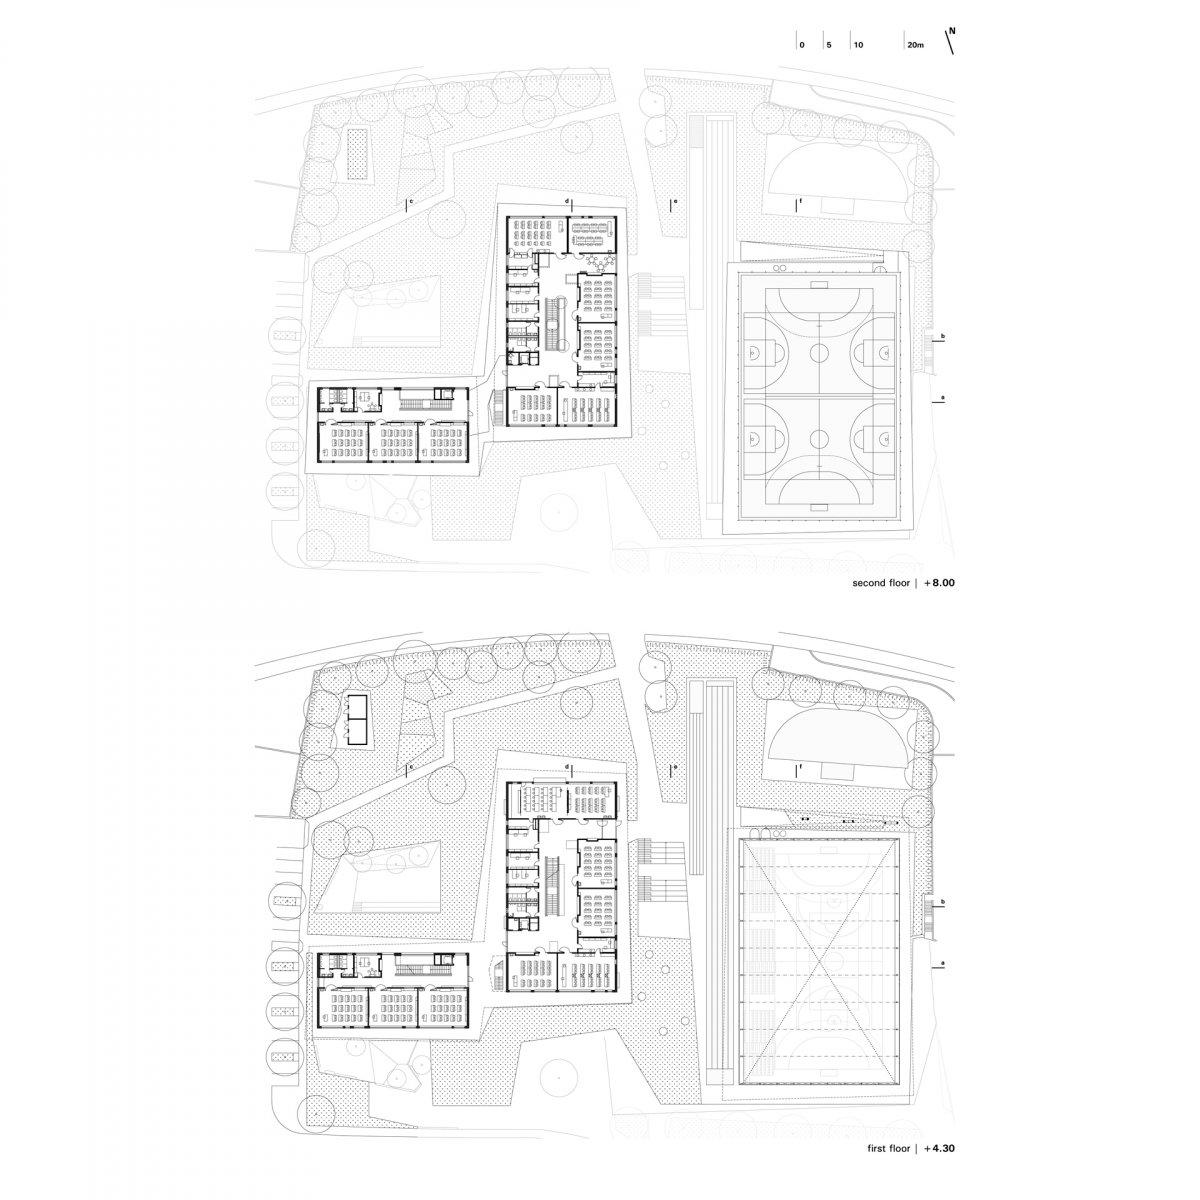 first / second floor plan